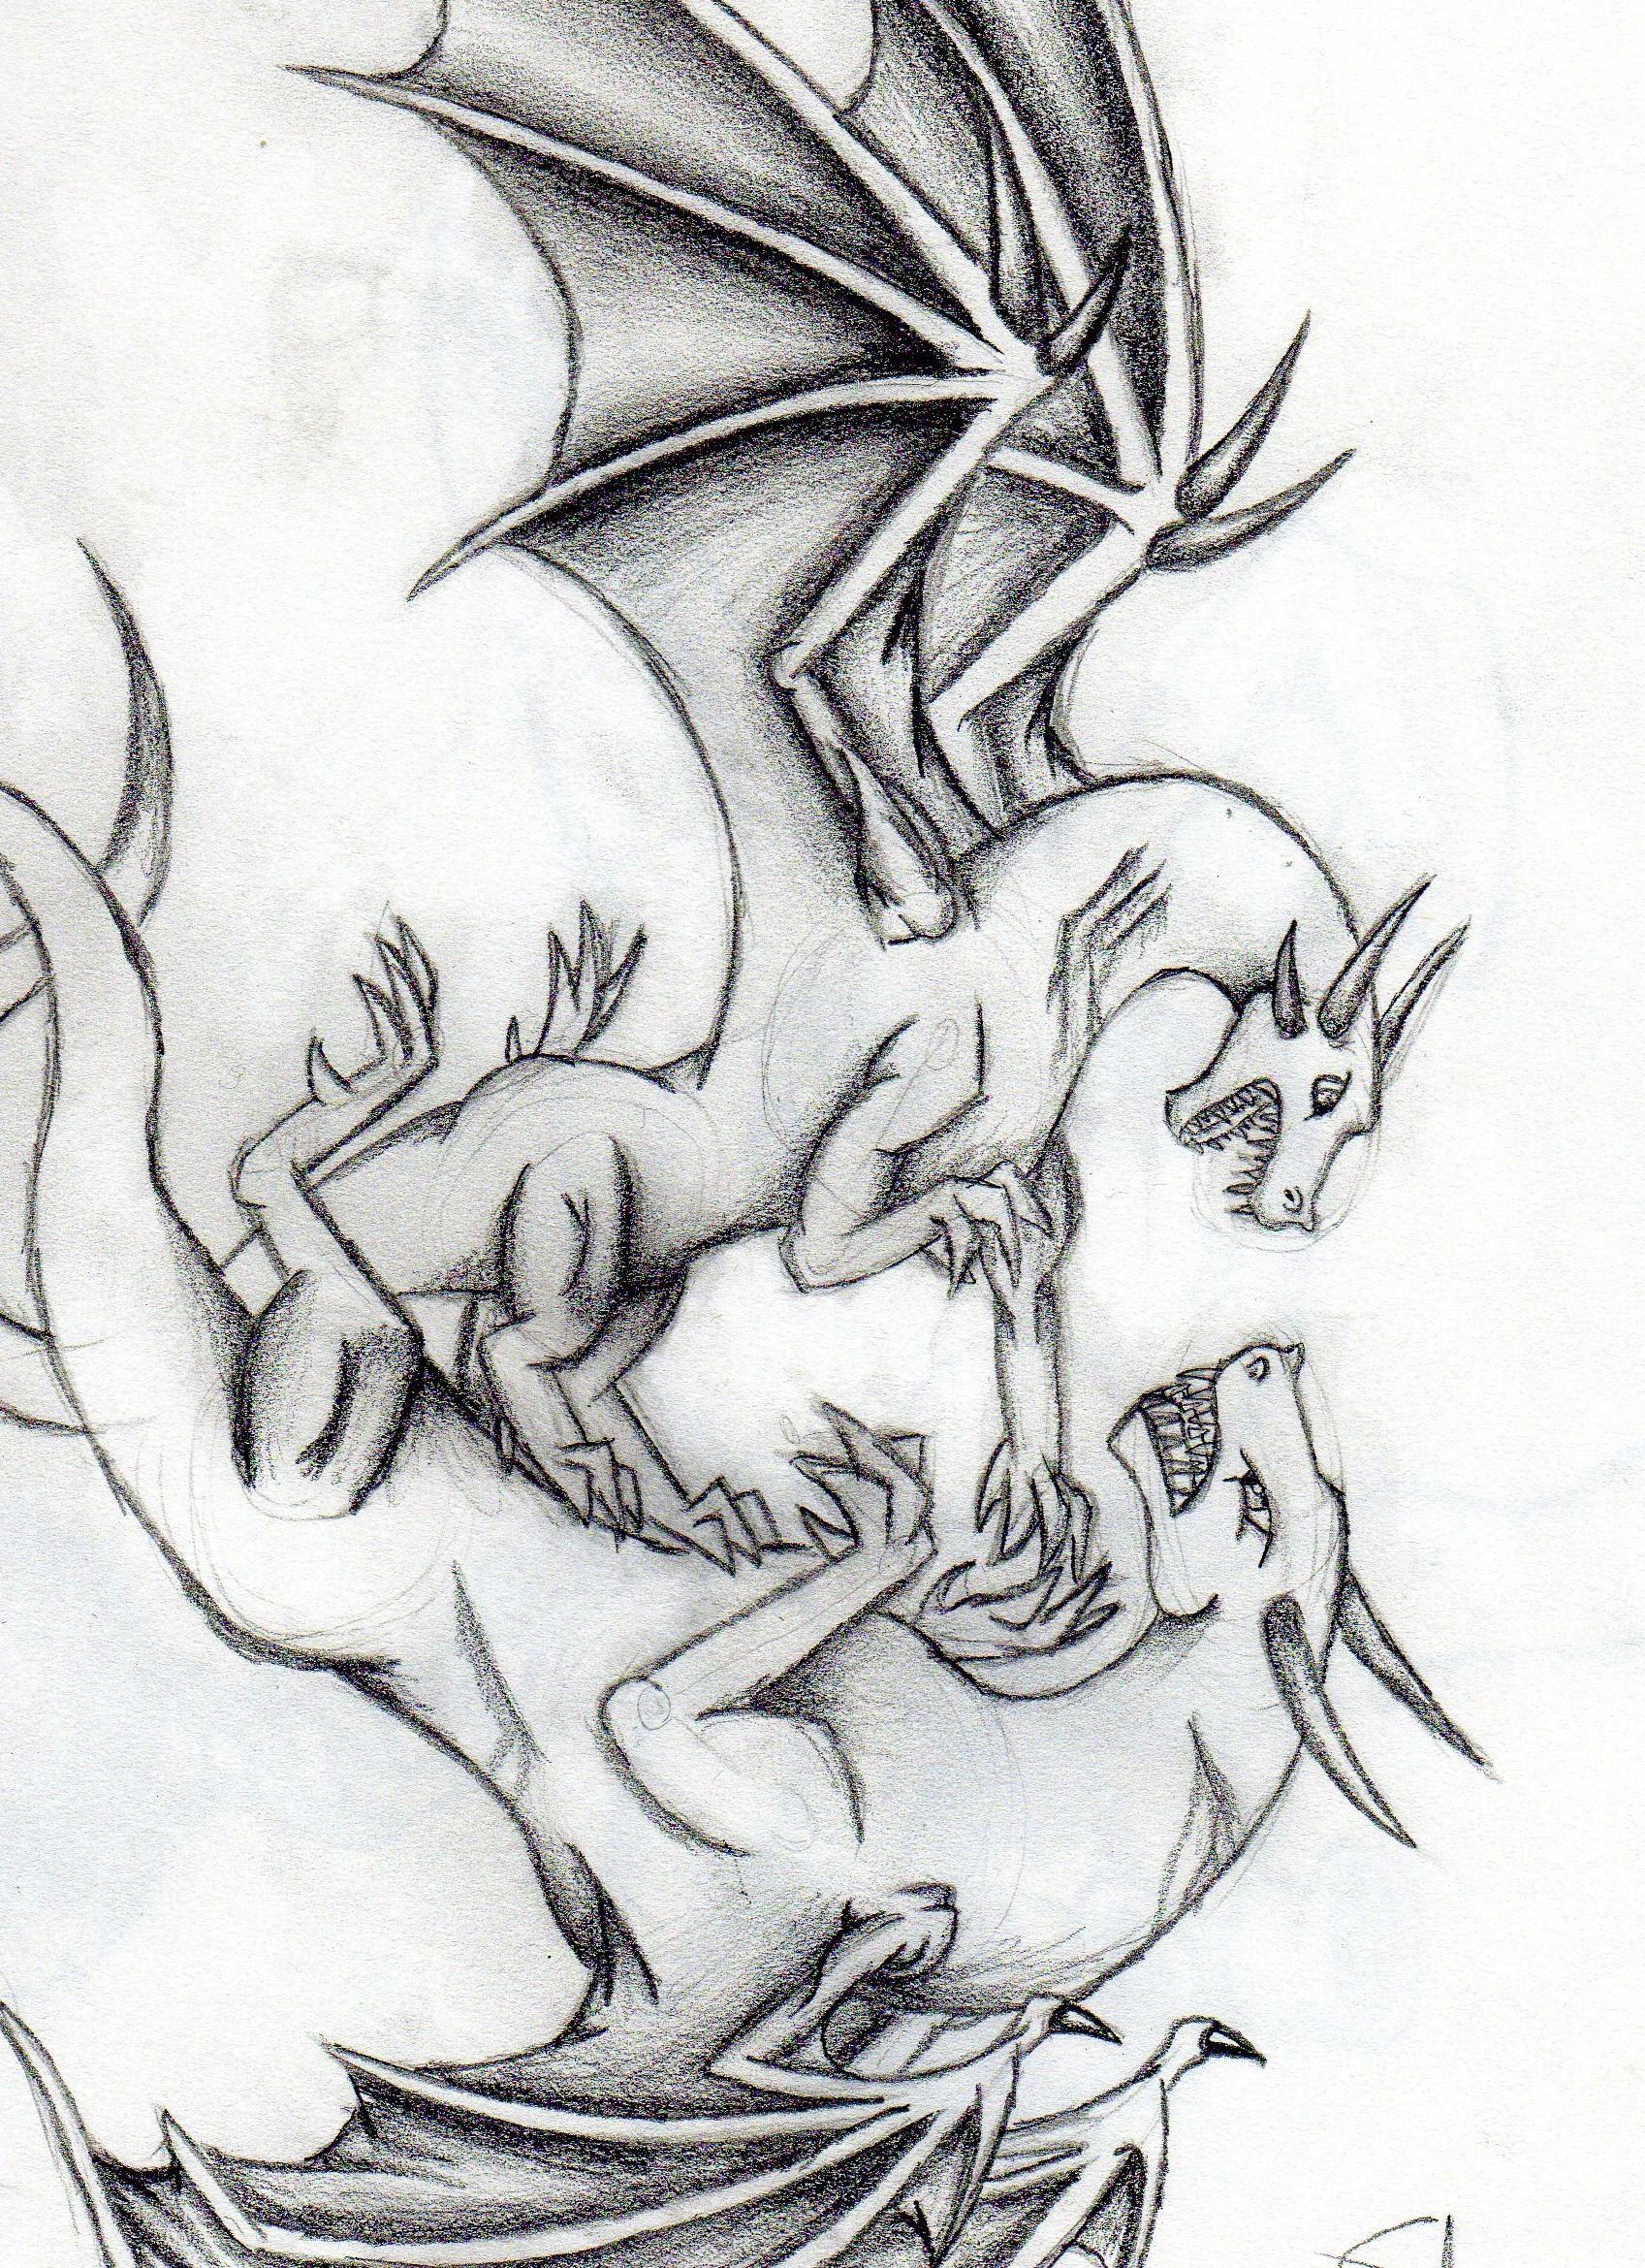 Dragon Fight :P